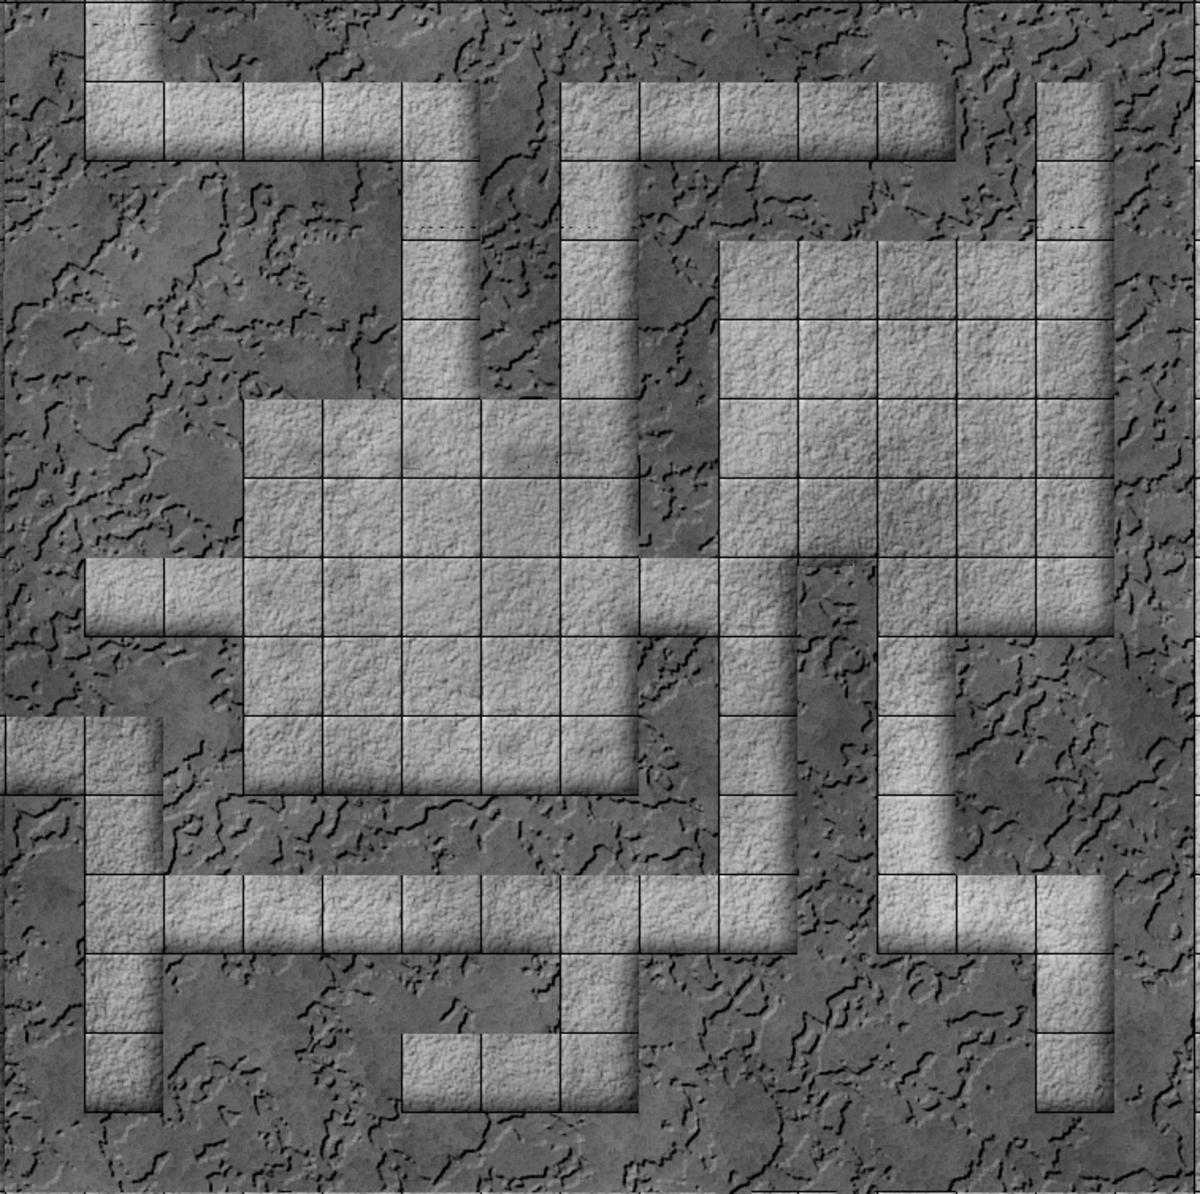 created with GIMP 2.10.12